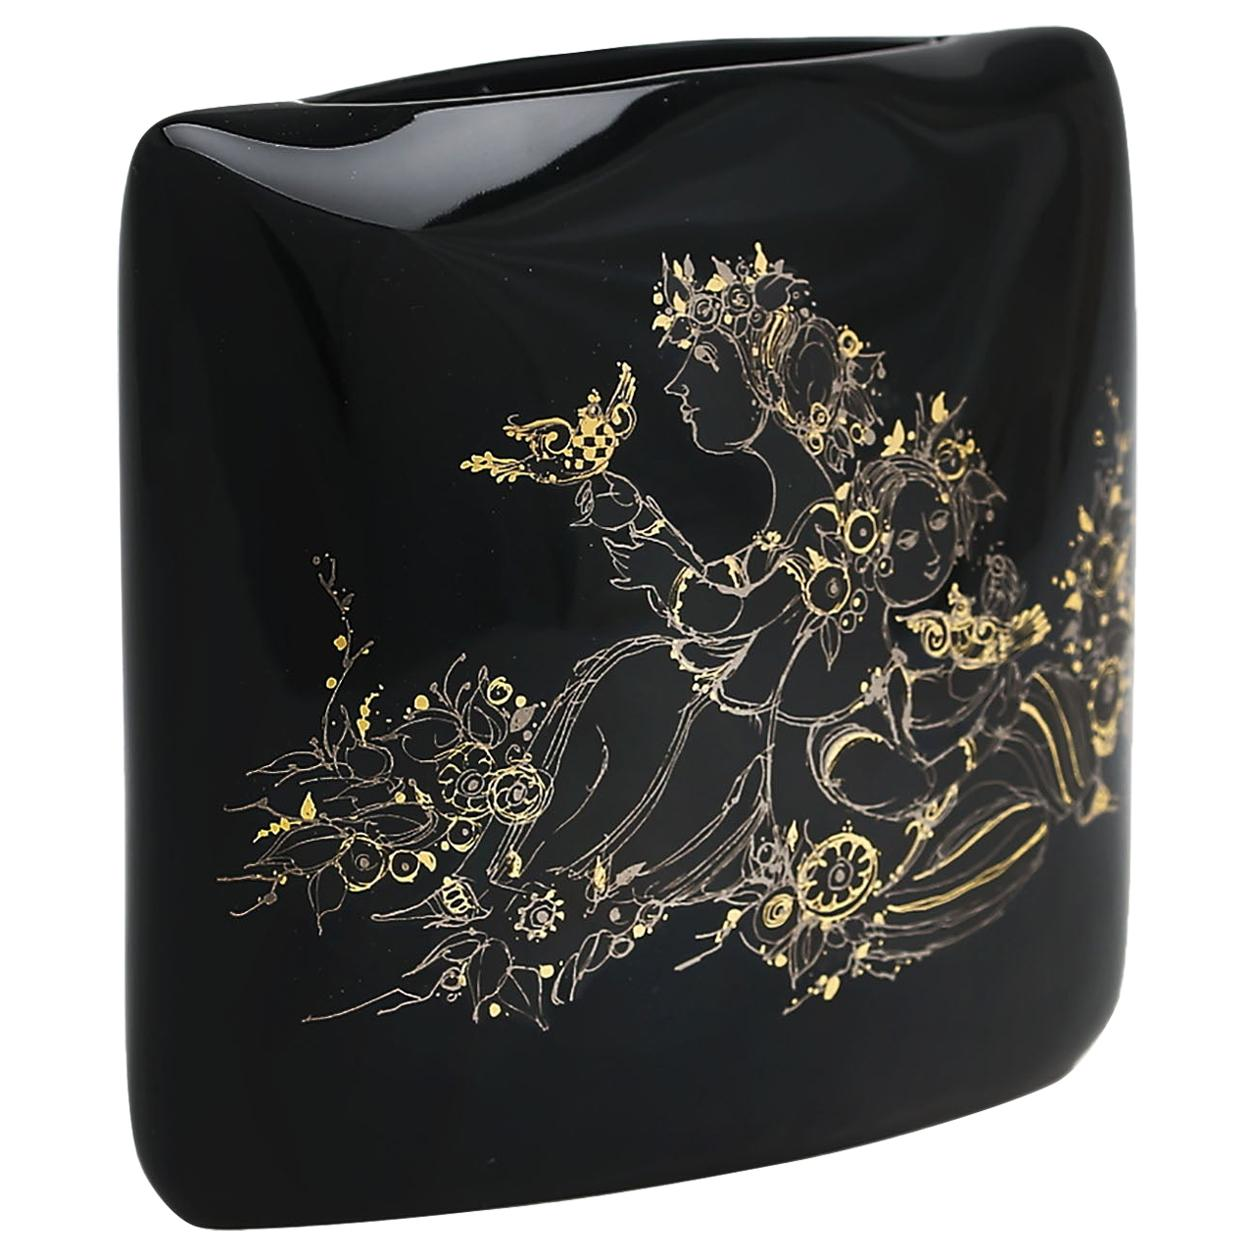 Mid-Century Modern Rosenthal Björn Wiinblad Porcelain Noire Vase